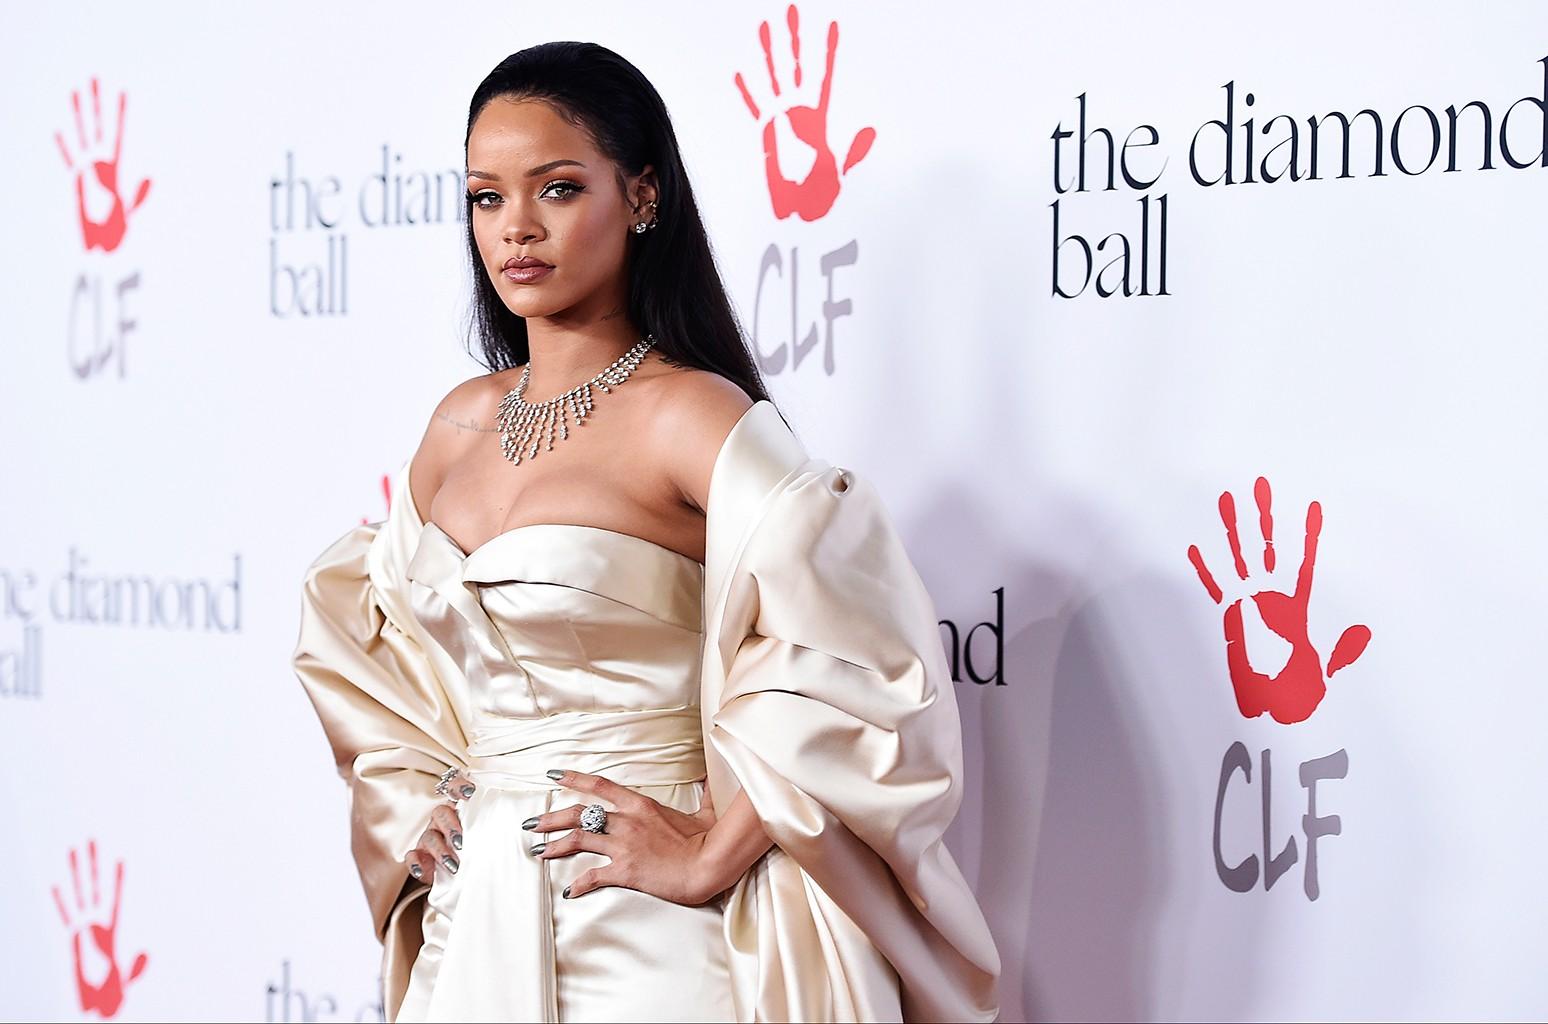 Rihanna attends the 2nd Annual Diamond Ball at The Barker Hangar on Dec. 10, 2015 in Santa Monica, Calif.